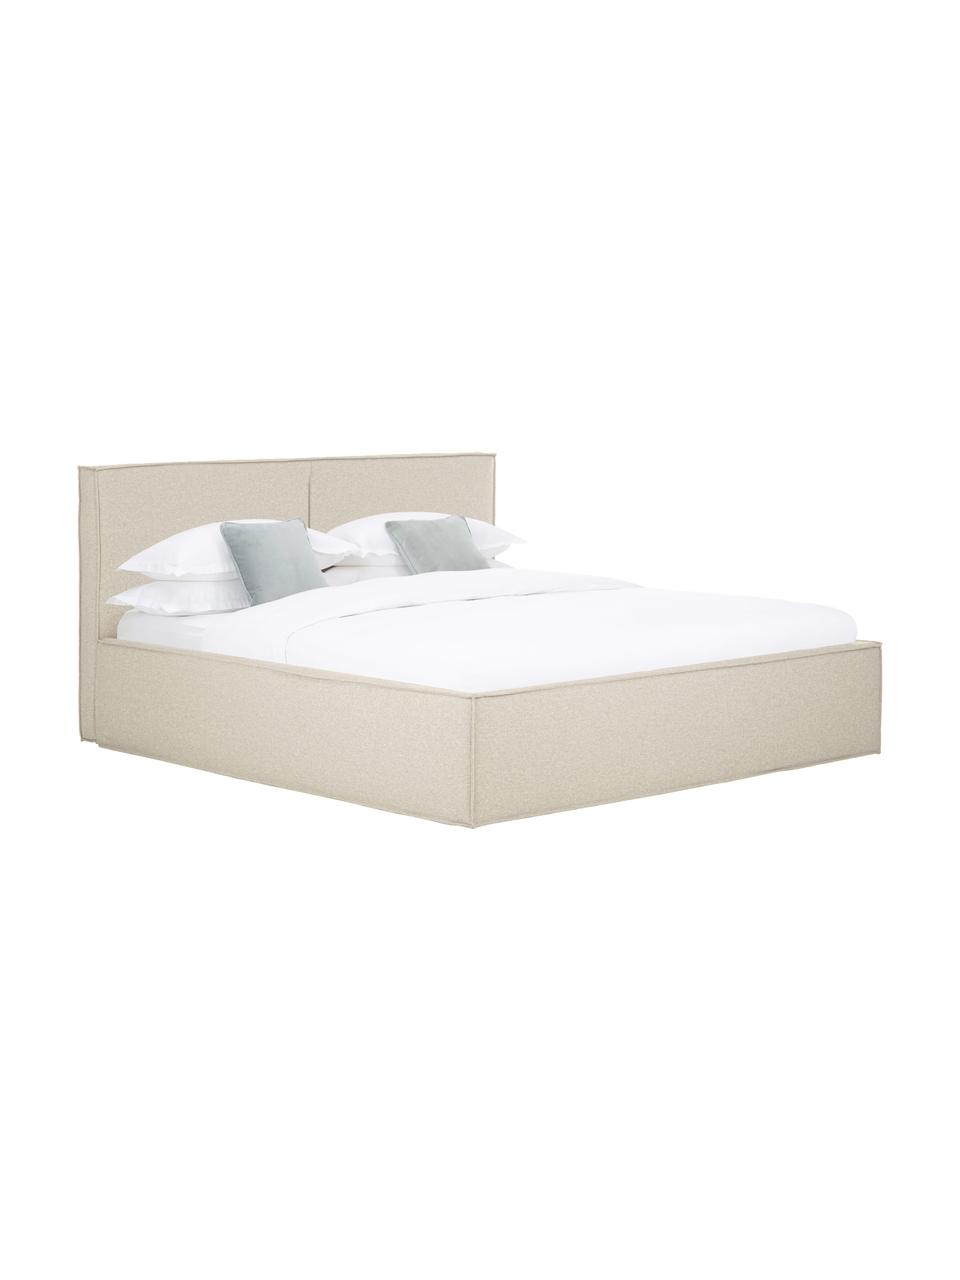 Gestoffeerd bed Dream in donkere beige, Frame: massief grenenhout en pla, Bekleding: polyester (gestructureerd, Stof taupe, 180 x 200 cm